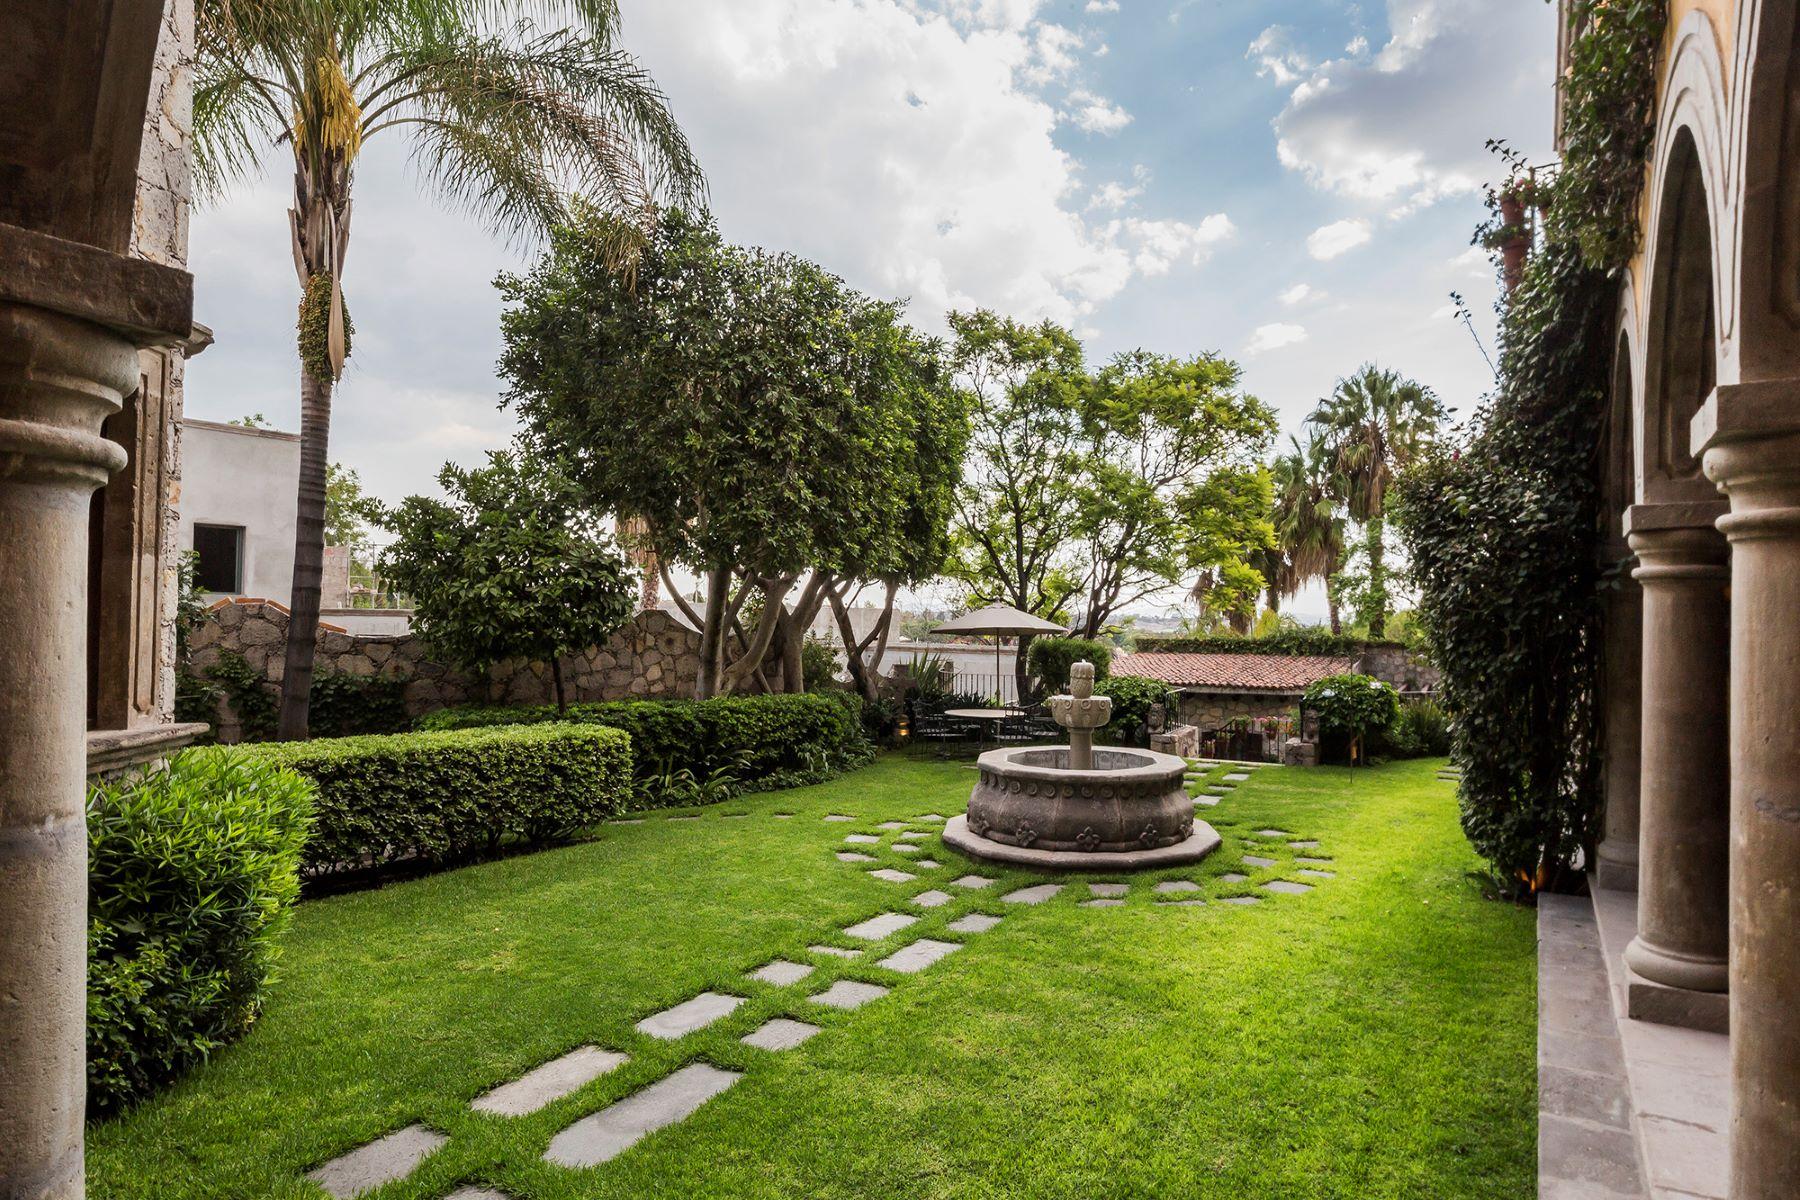 Additional photo for property listing at CASA DORADO Recreo San Miguel De Allende, Guanajuato 37700 Mexico